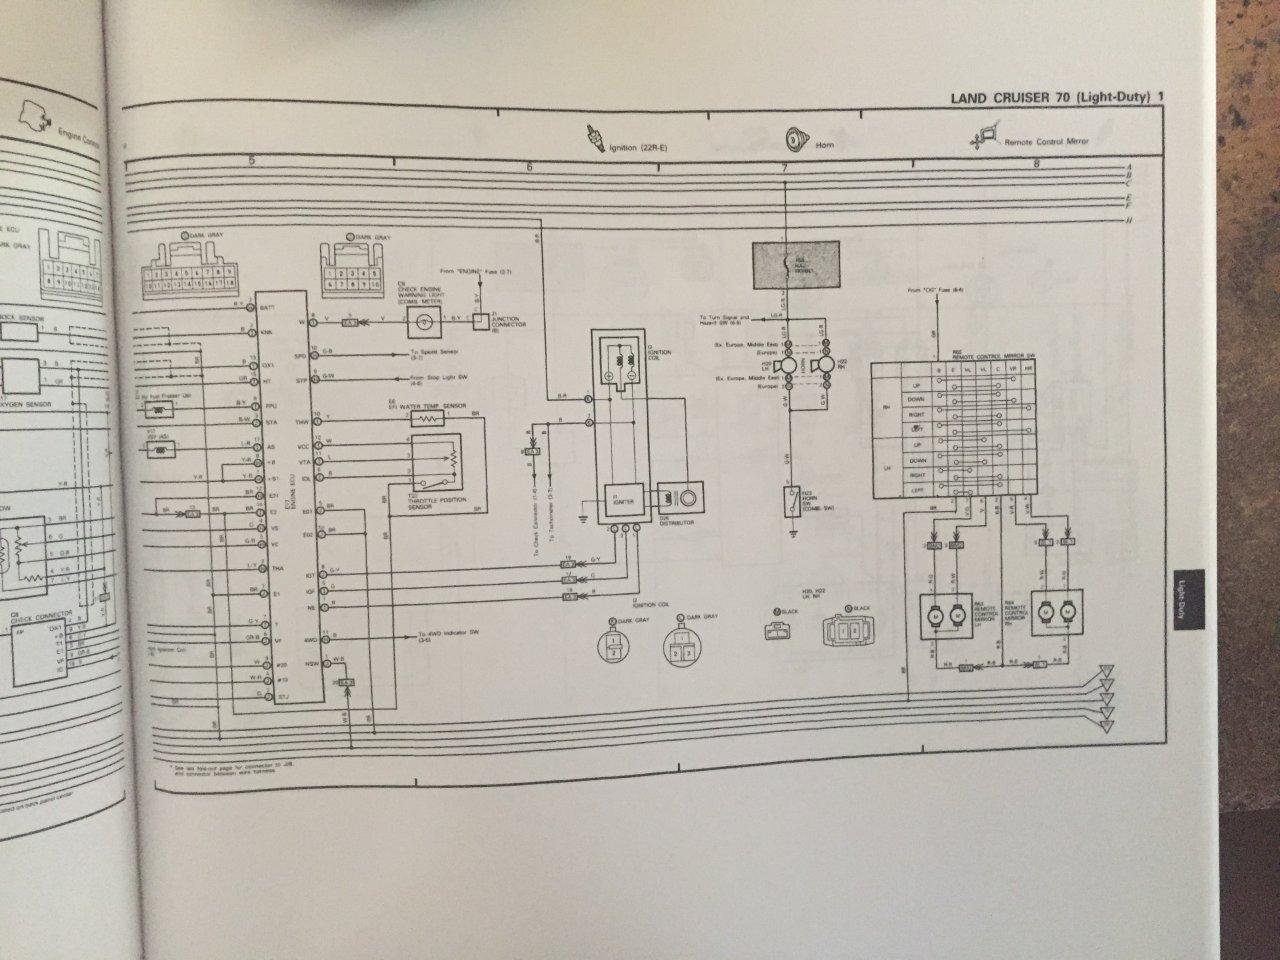 need help asap with lj71 wiring ih8mud forum rh forum ih8mud com Residential Electrical Wiring Diagrams Residential Electrical Wiring Diagrams